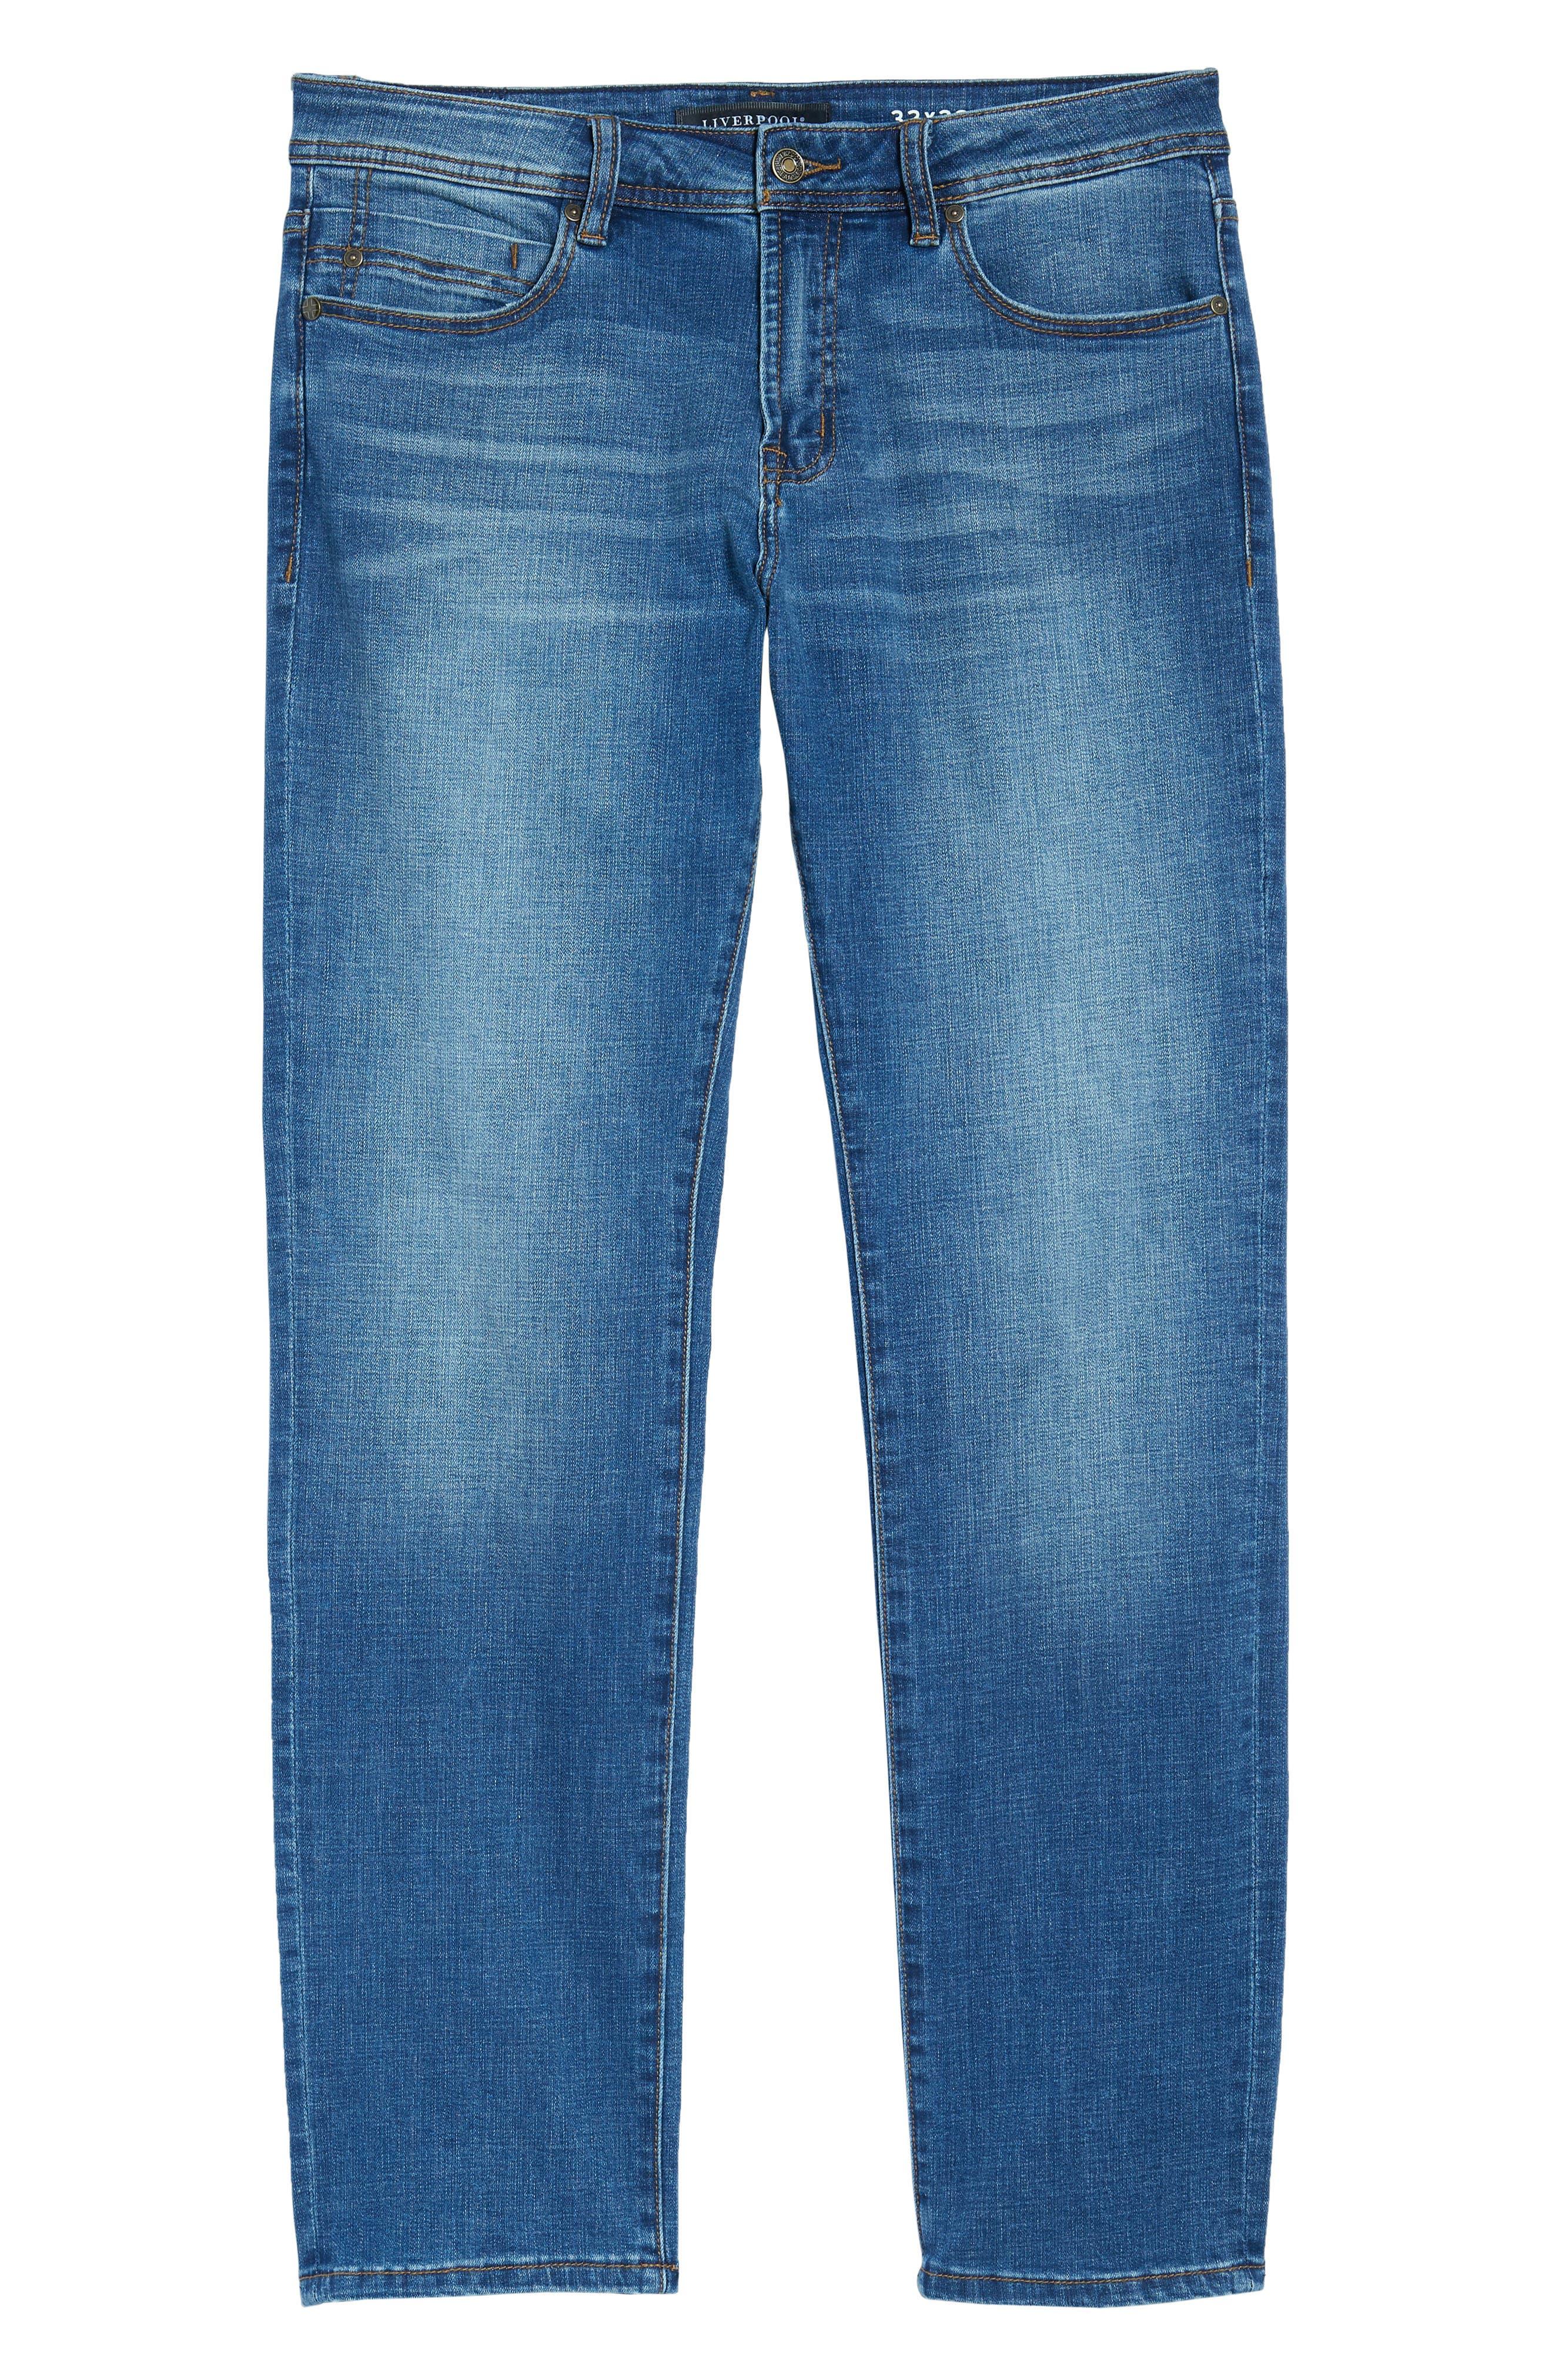 Jeans Co. Regent Relaxed Straight Leg Jeans,                             Alternate thumbnail 6, color,                             Highlander Mid